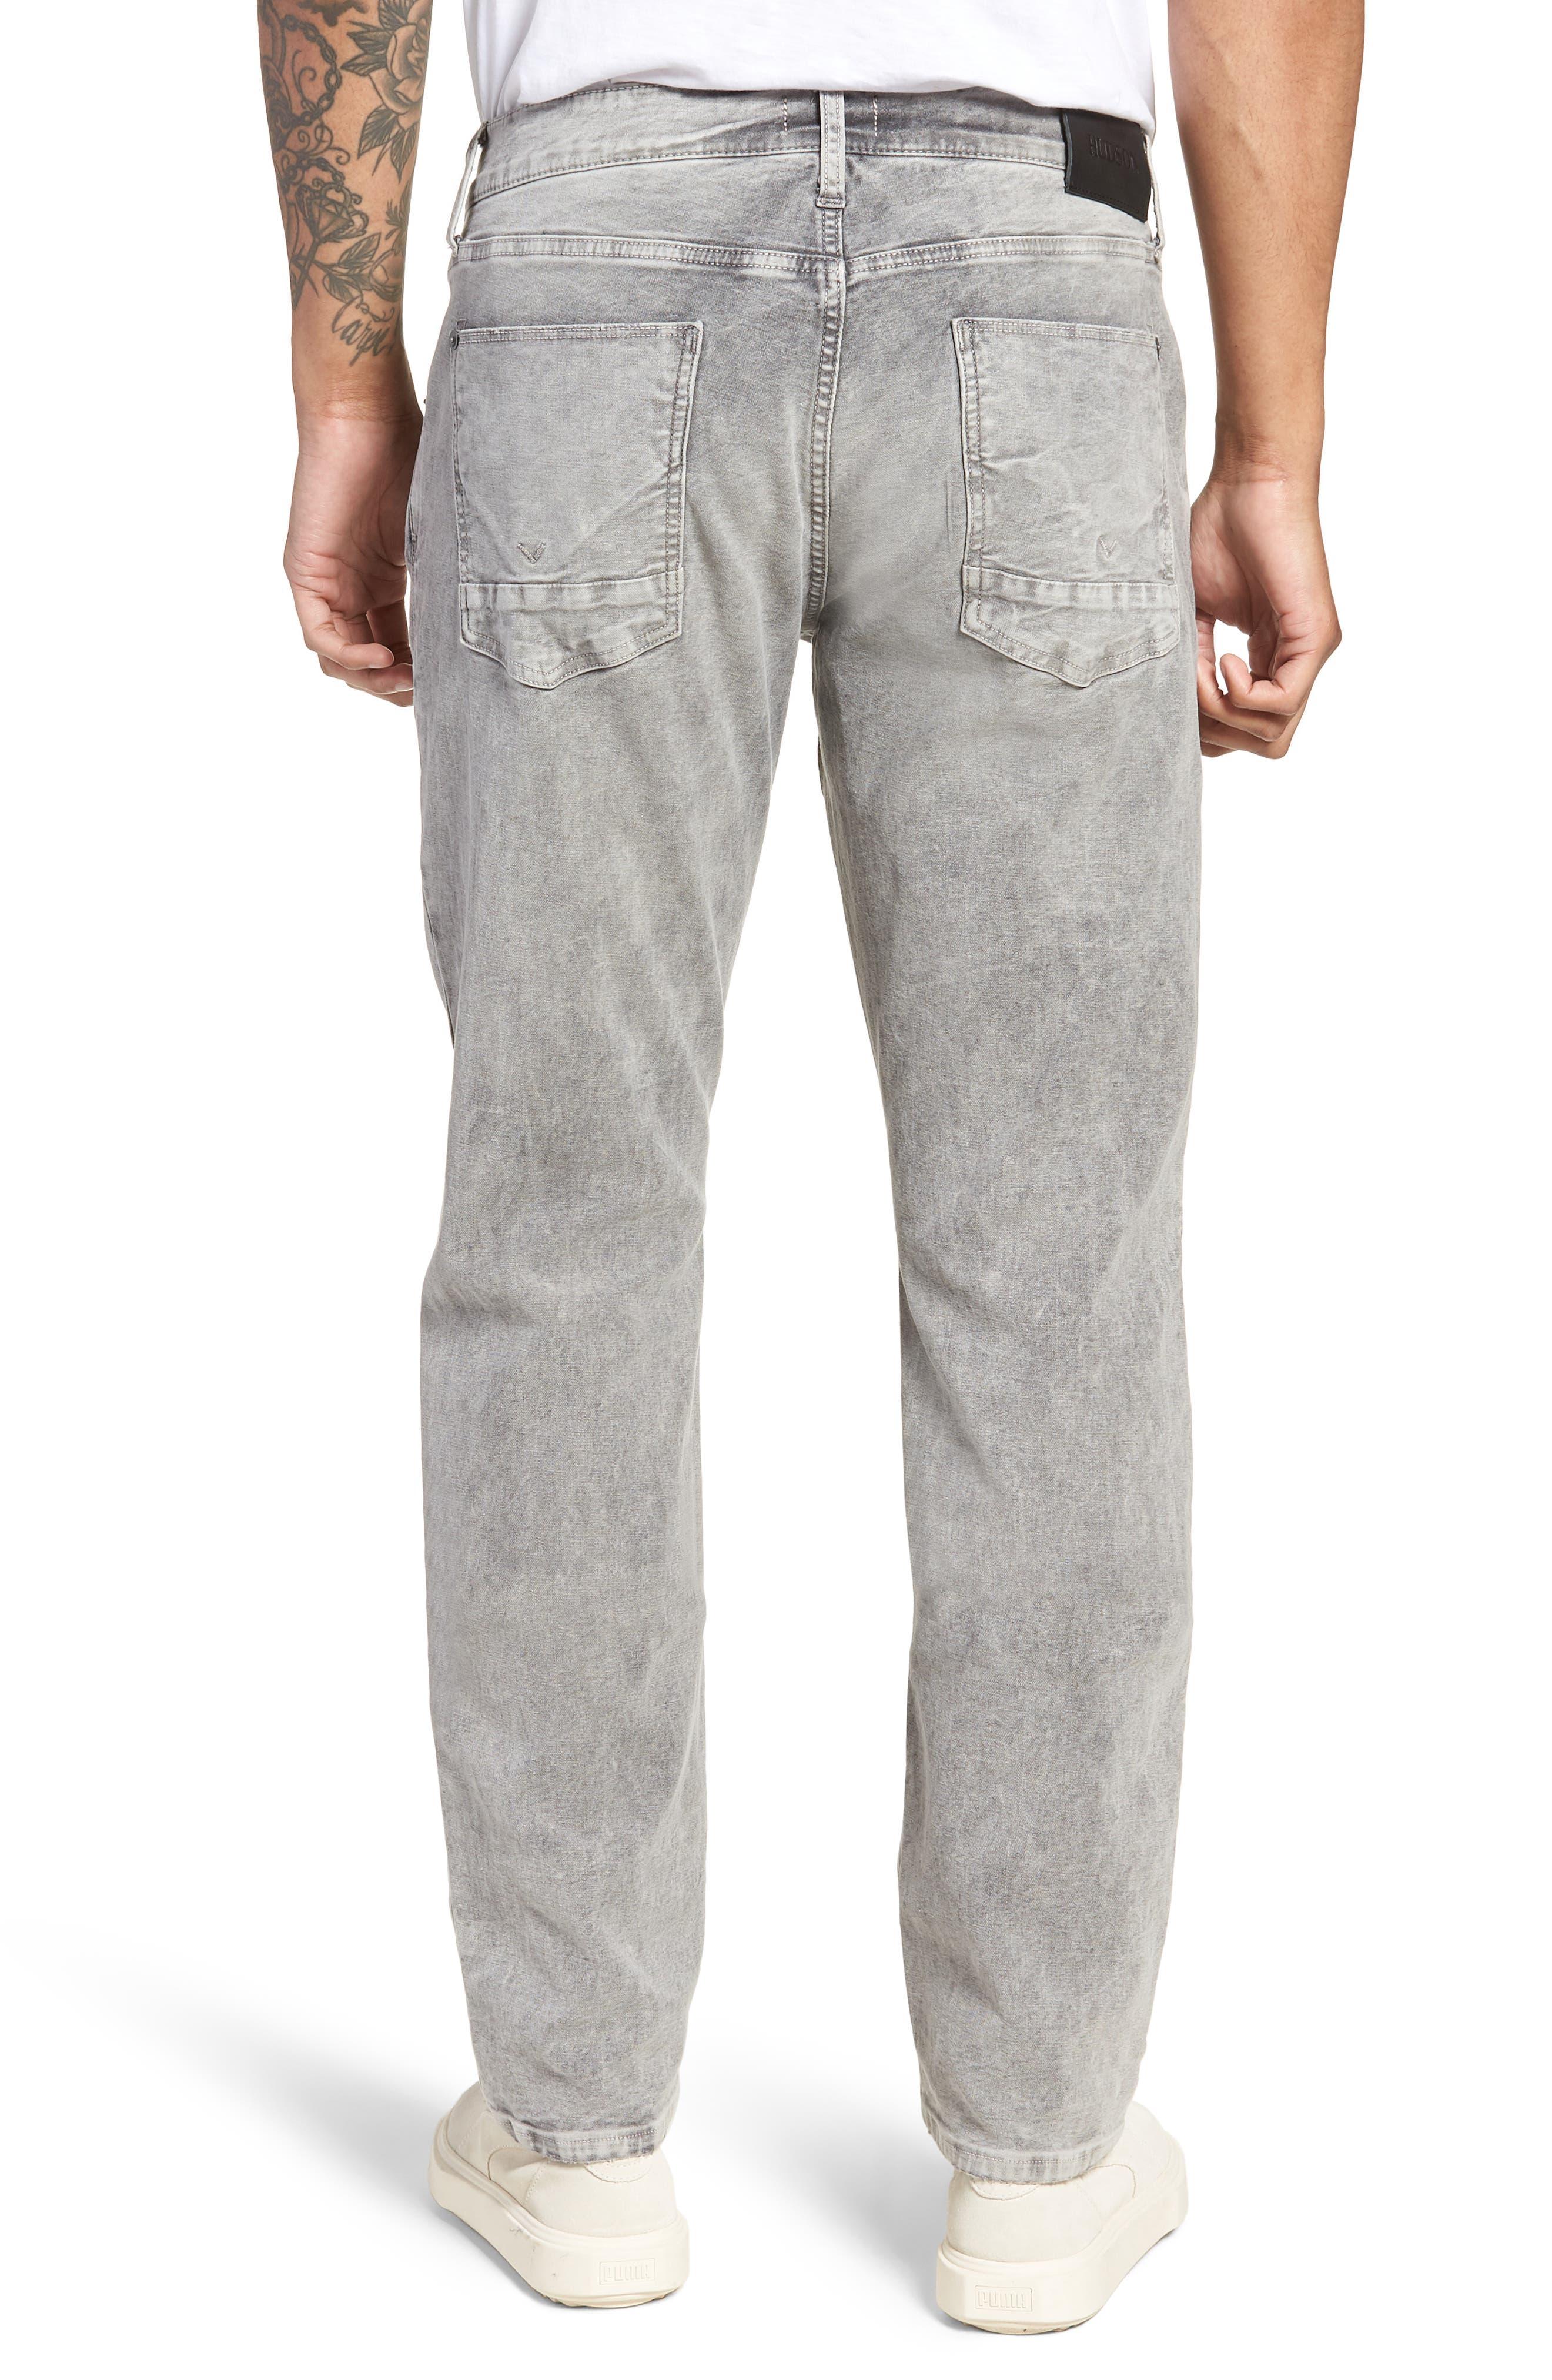 Blake Slim Fit Jeans,                             Alternate thumbnail 2, color,                             063